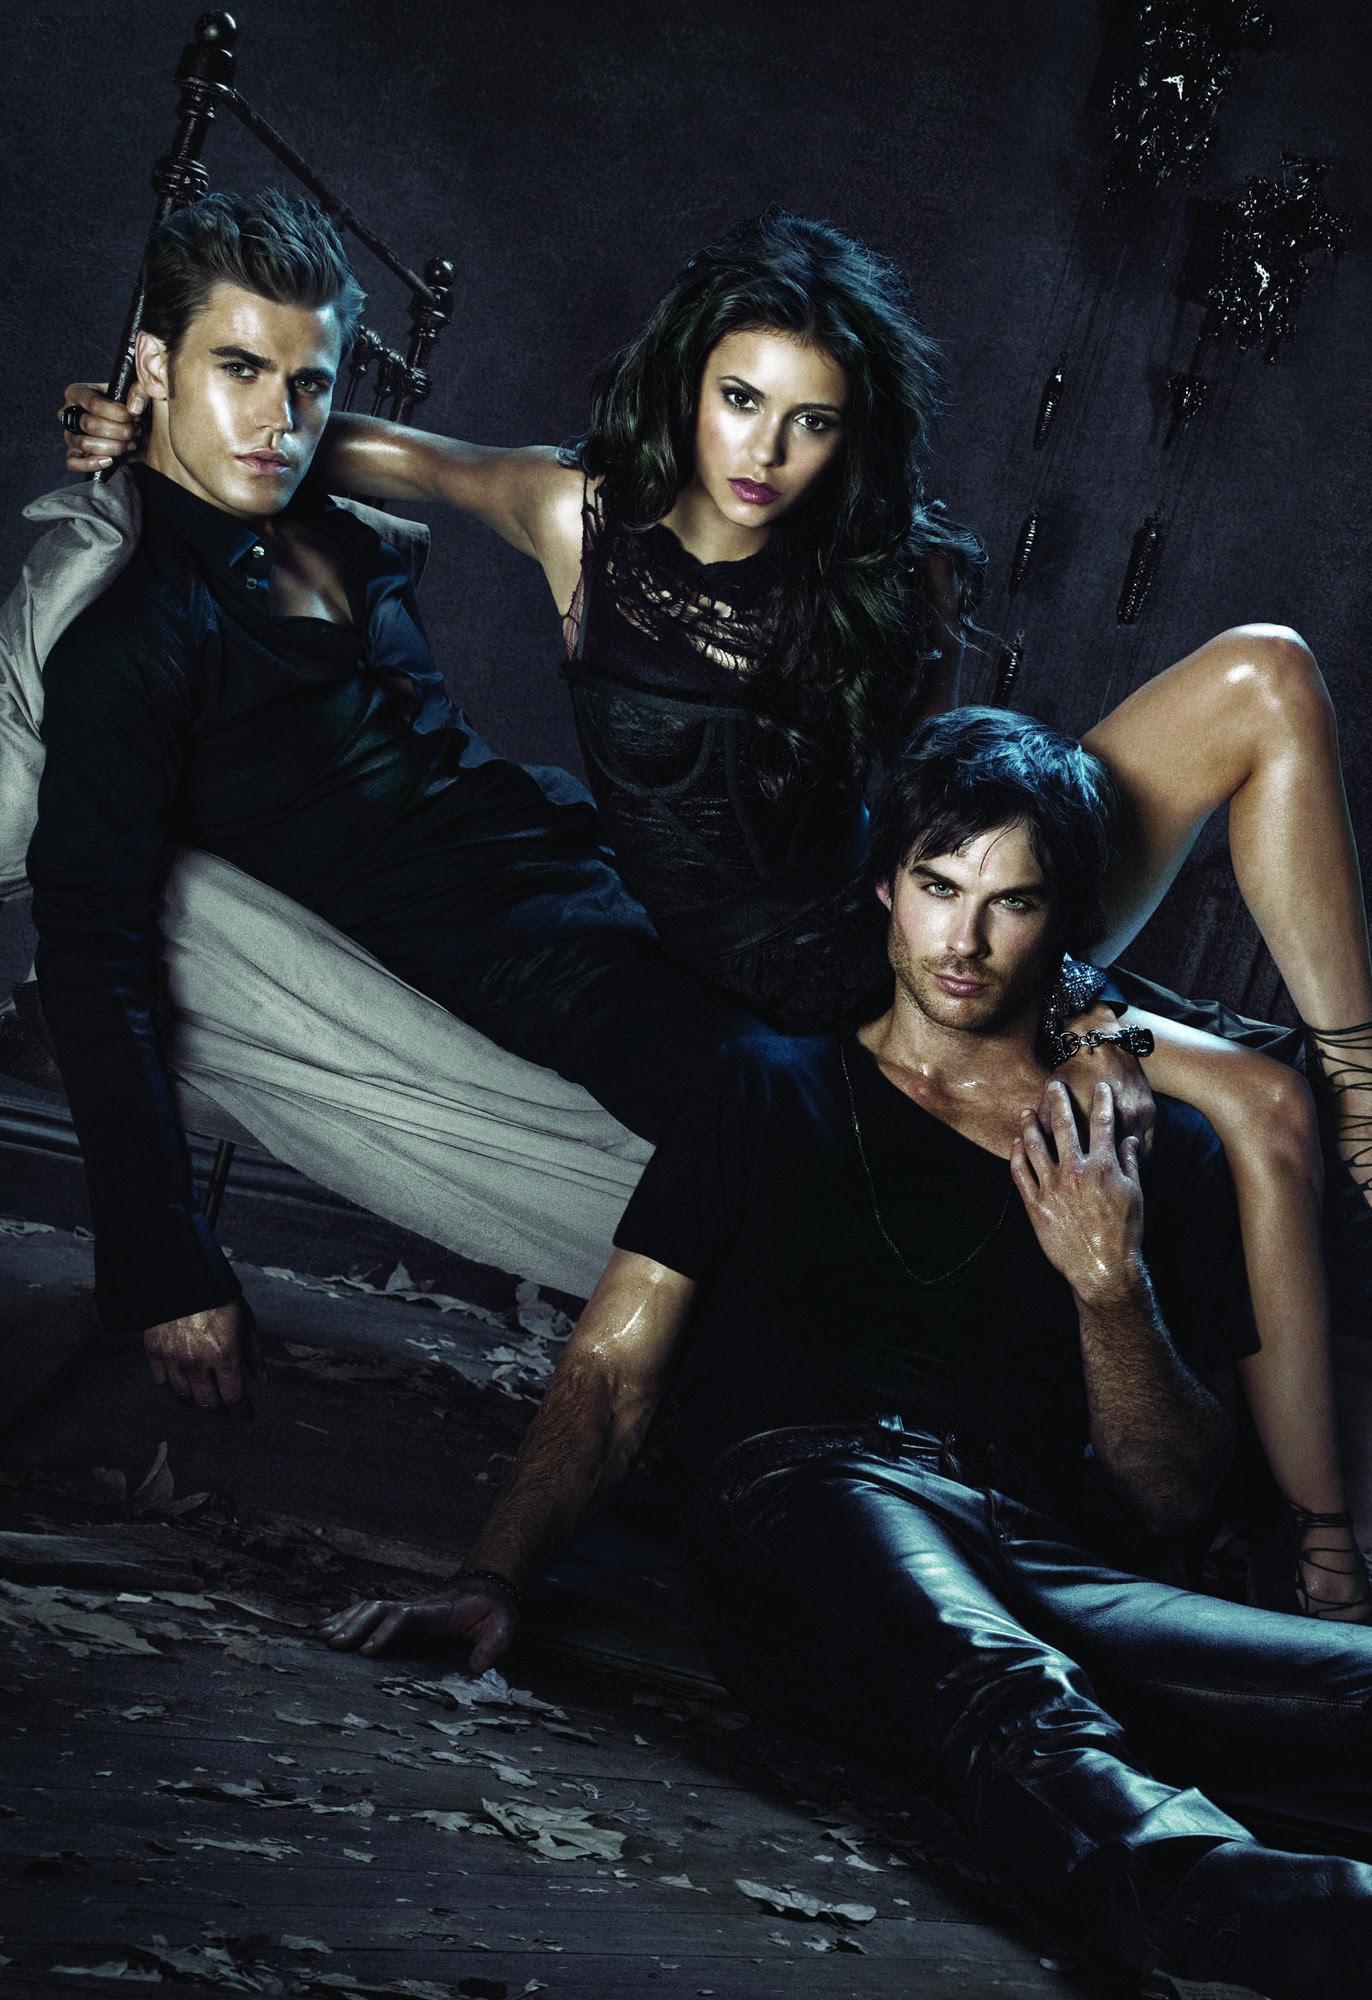 Damon Salvatore Vampire Diaries Wallpaper 76 Images